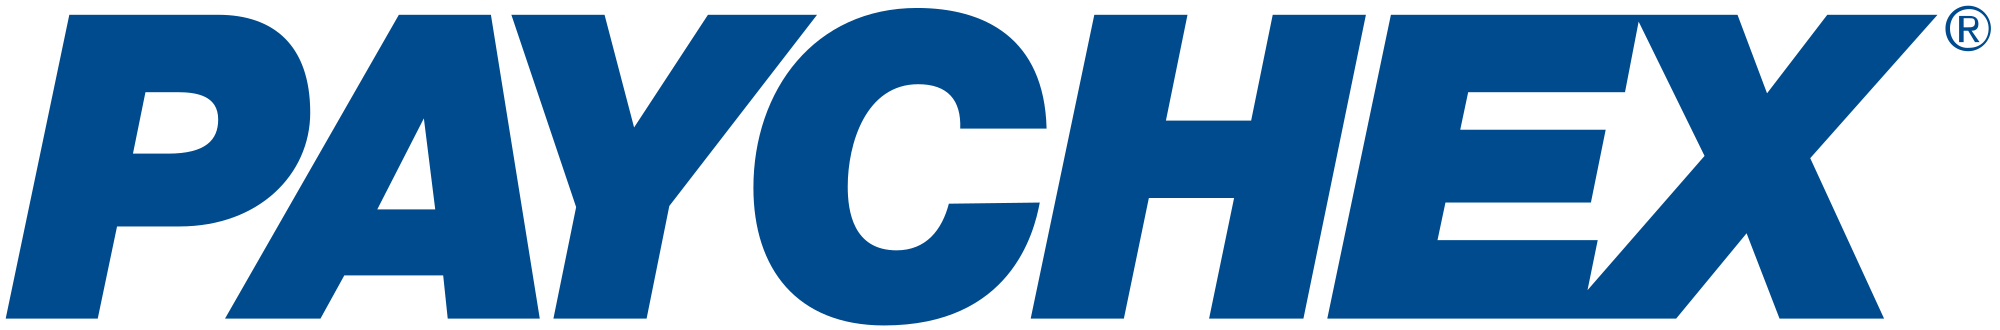 2000px-Paychex_logo.svg[1]